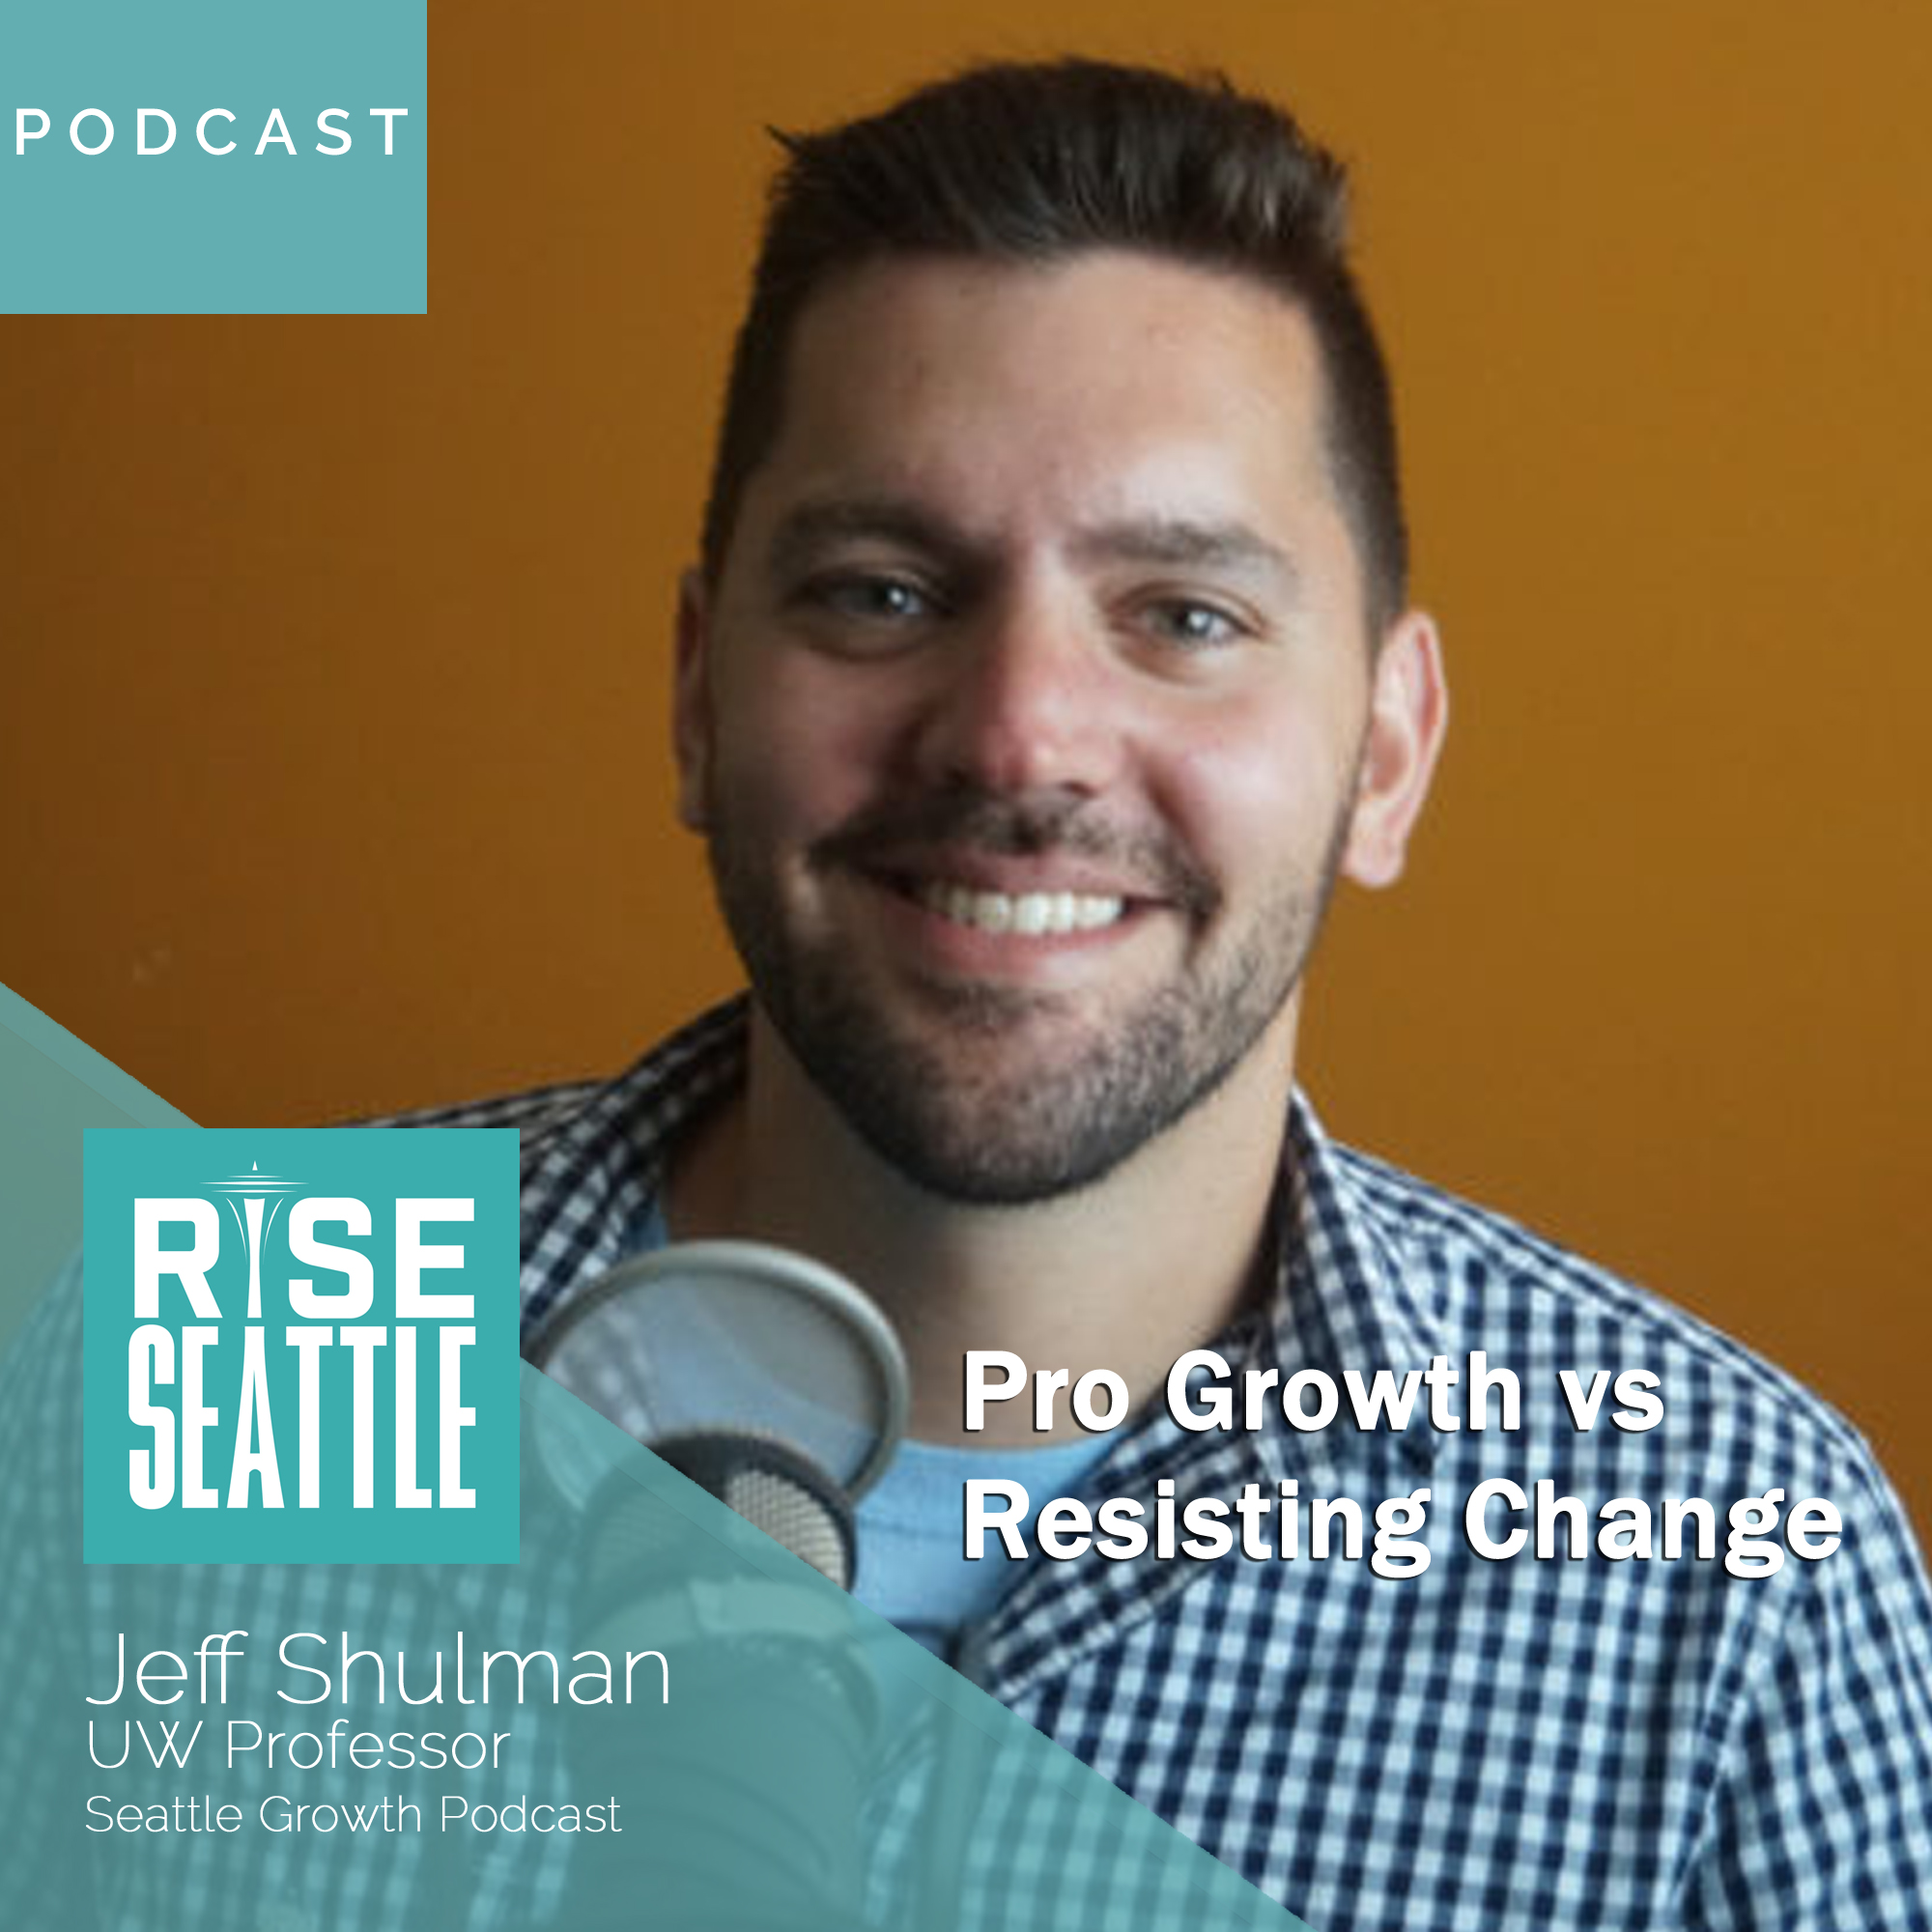 S1.E14 UW Prof Jeff Shulman: Pro Growth Vs Resisting Change